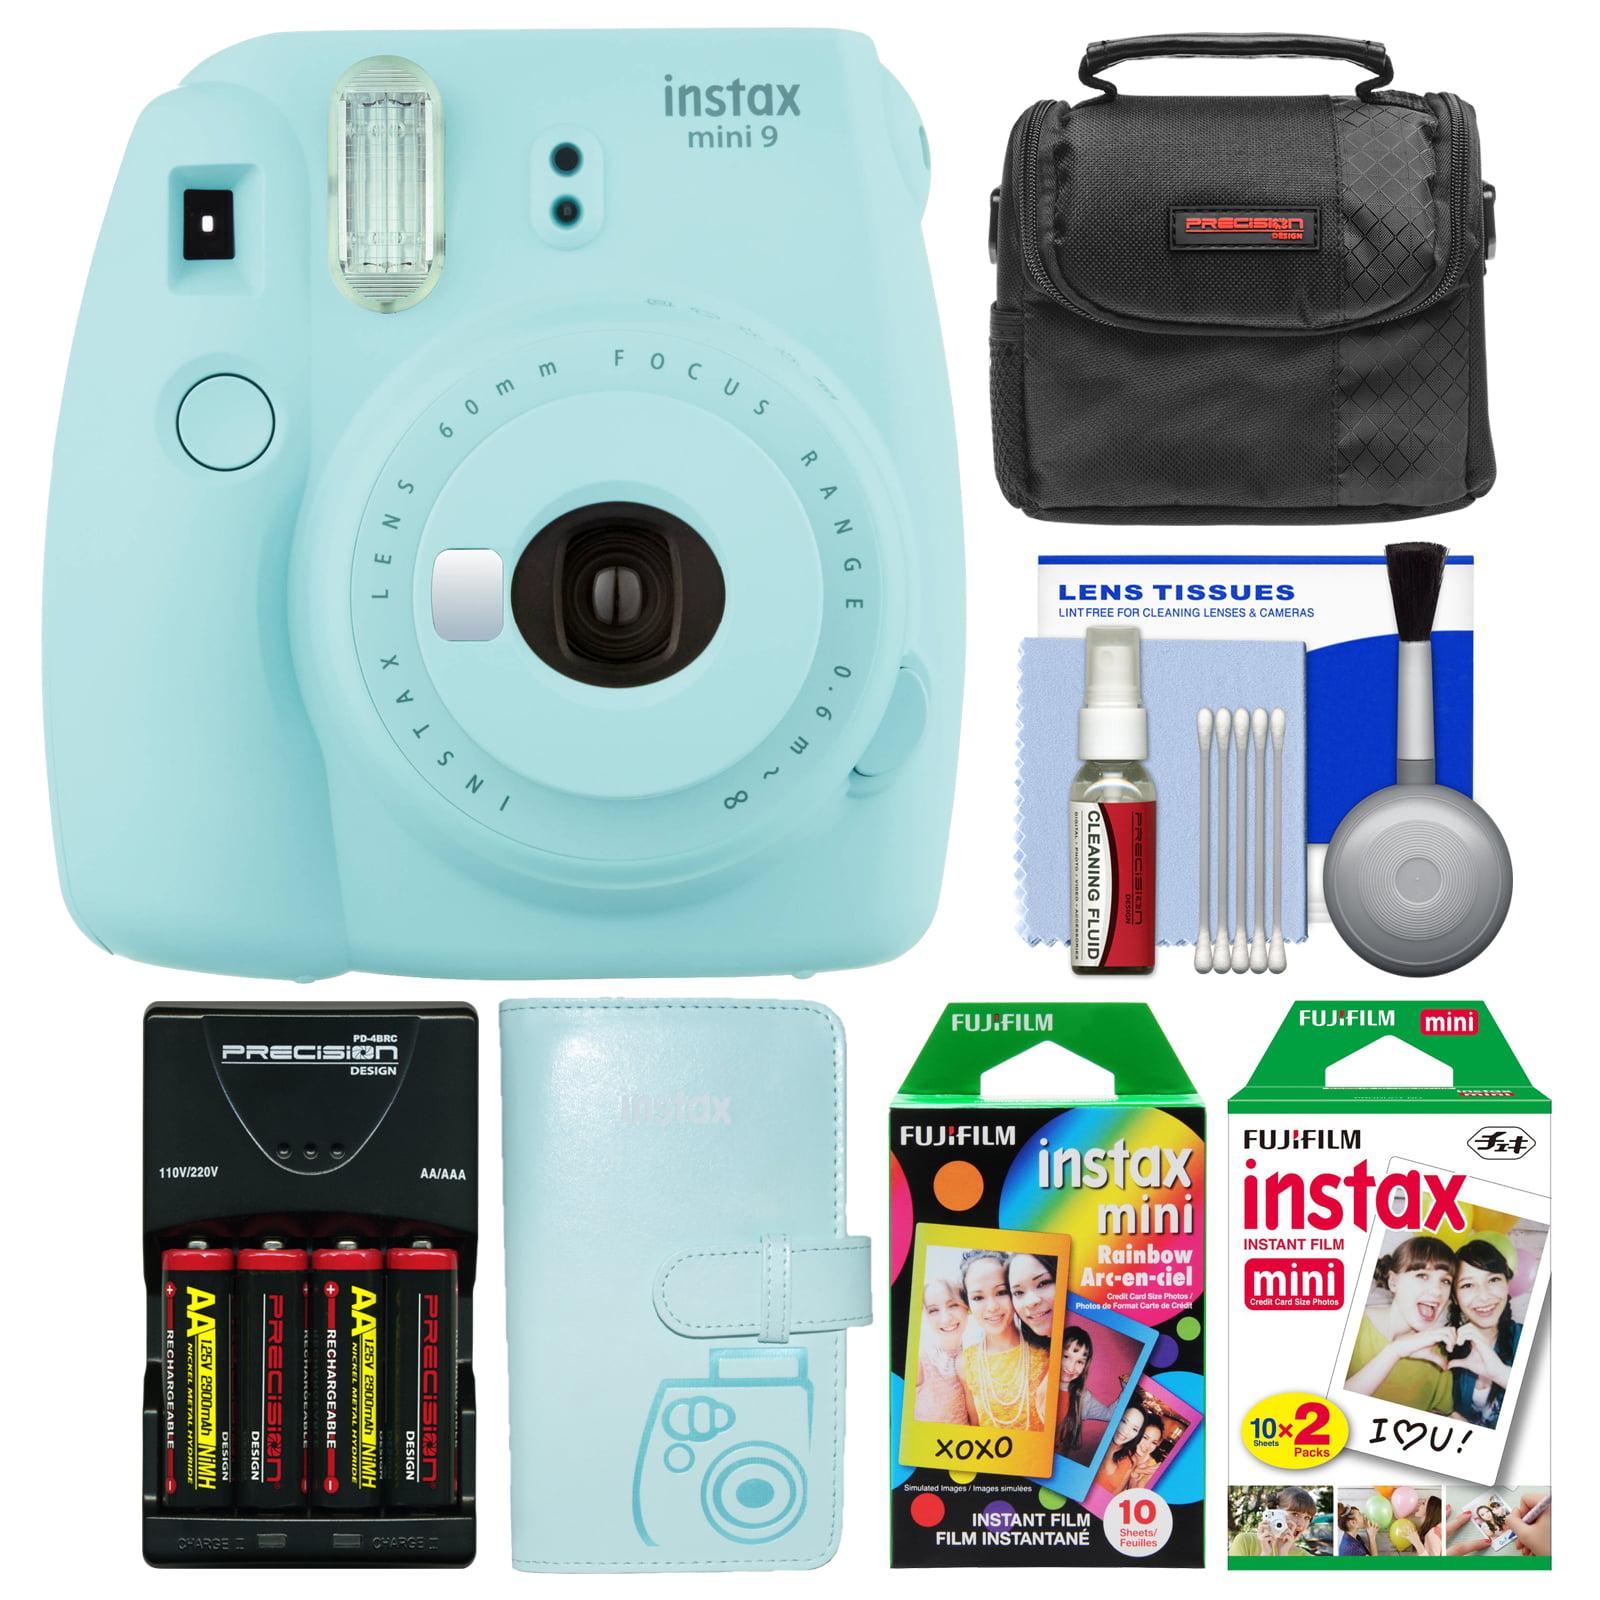 FujiFilm Instax Mini 9 Instant Film Camera (Ice Blue) with Photo Album + 20 Twin & 10 Rainbow Prints + Case + Batteries... by Fujifilm